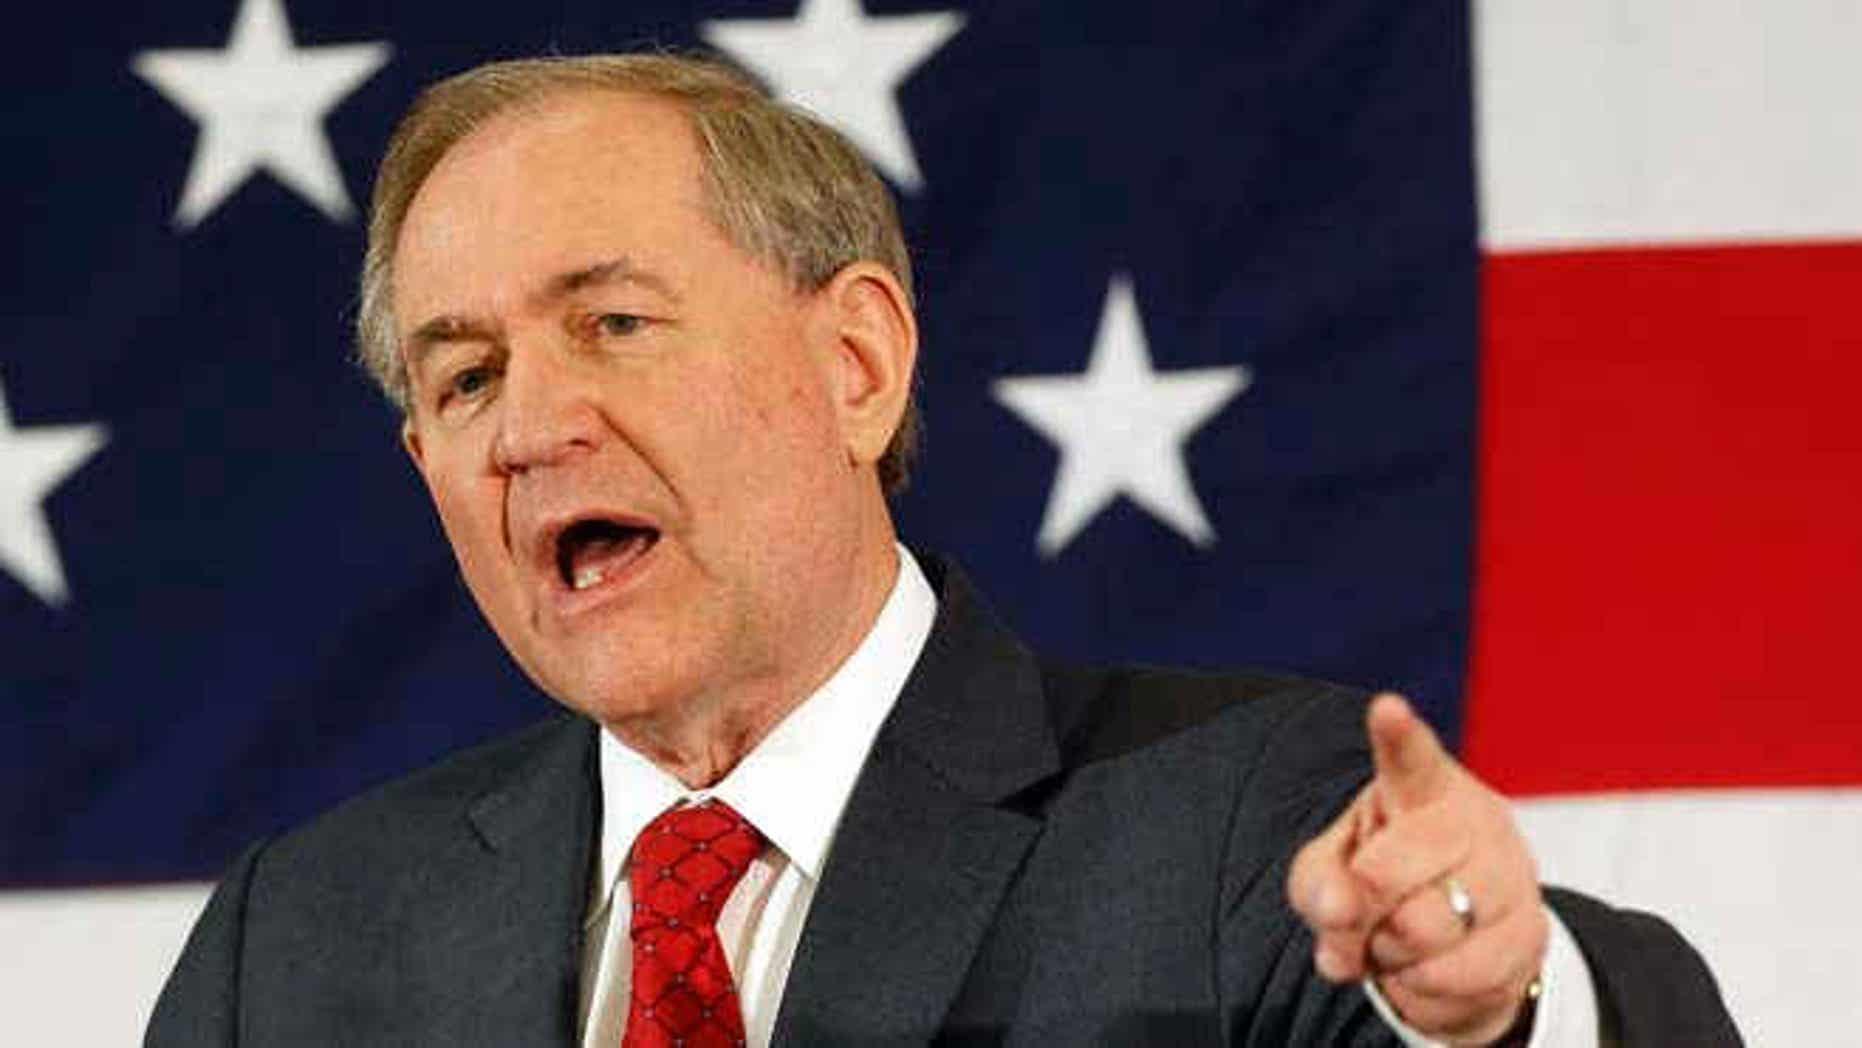 April 17, 2015: Ex-Virginia Gov. Jim Gilmore speaks at a Republican Leadership Summit in Nashua, N.H.